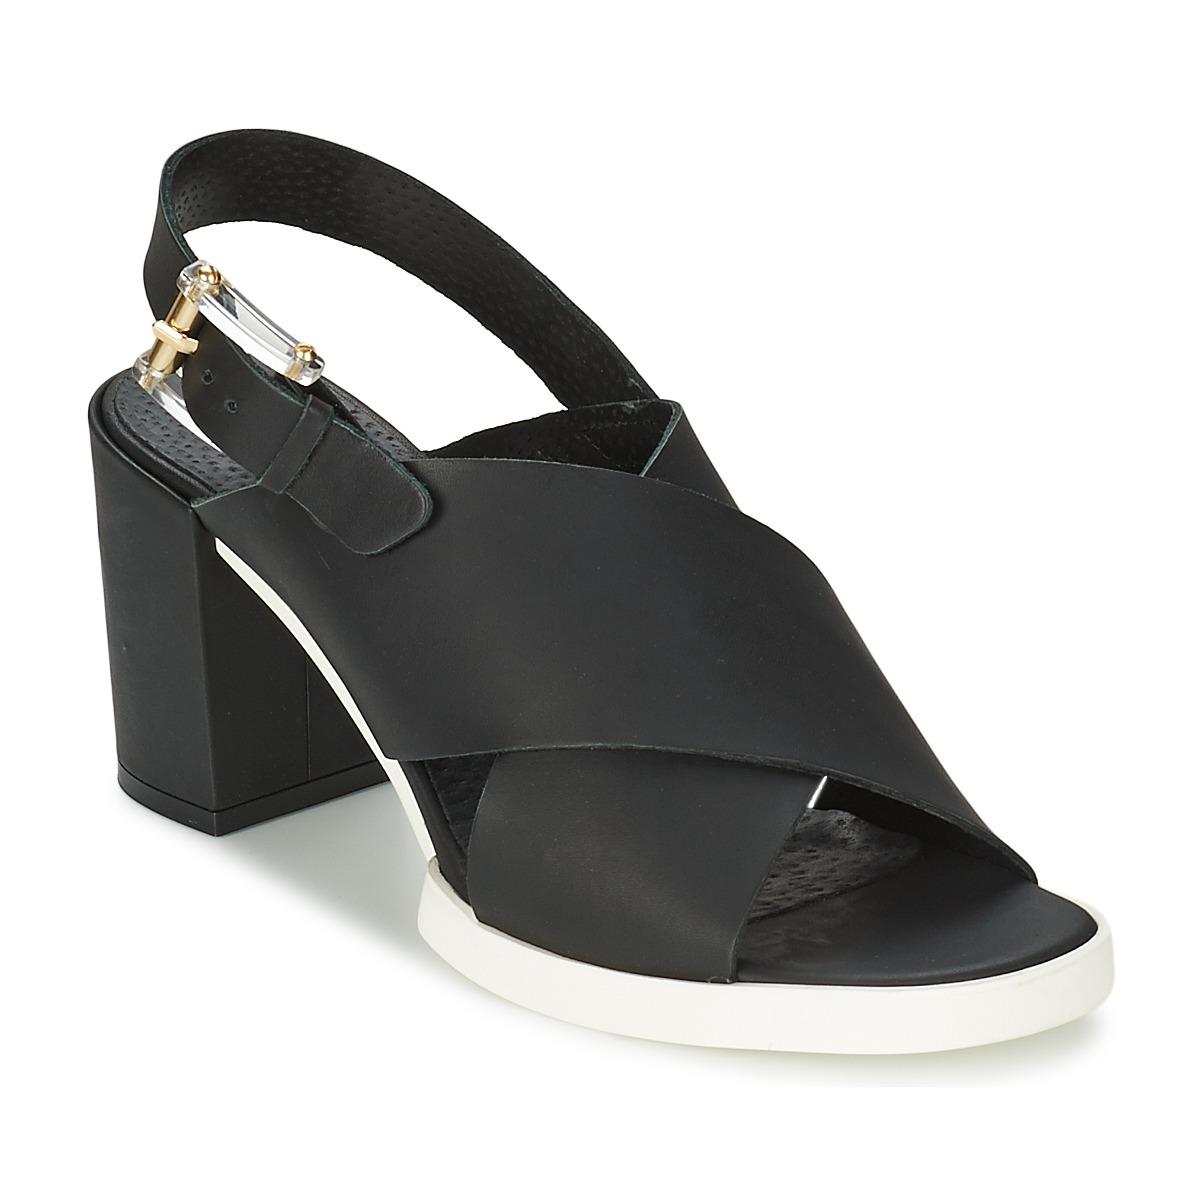 Sandale Miista DELILIAH Noir